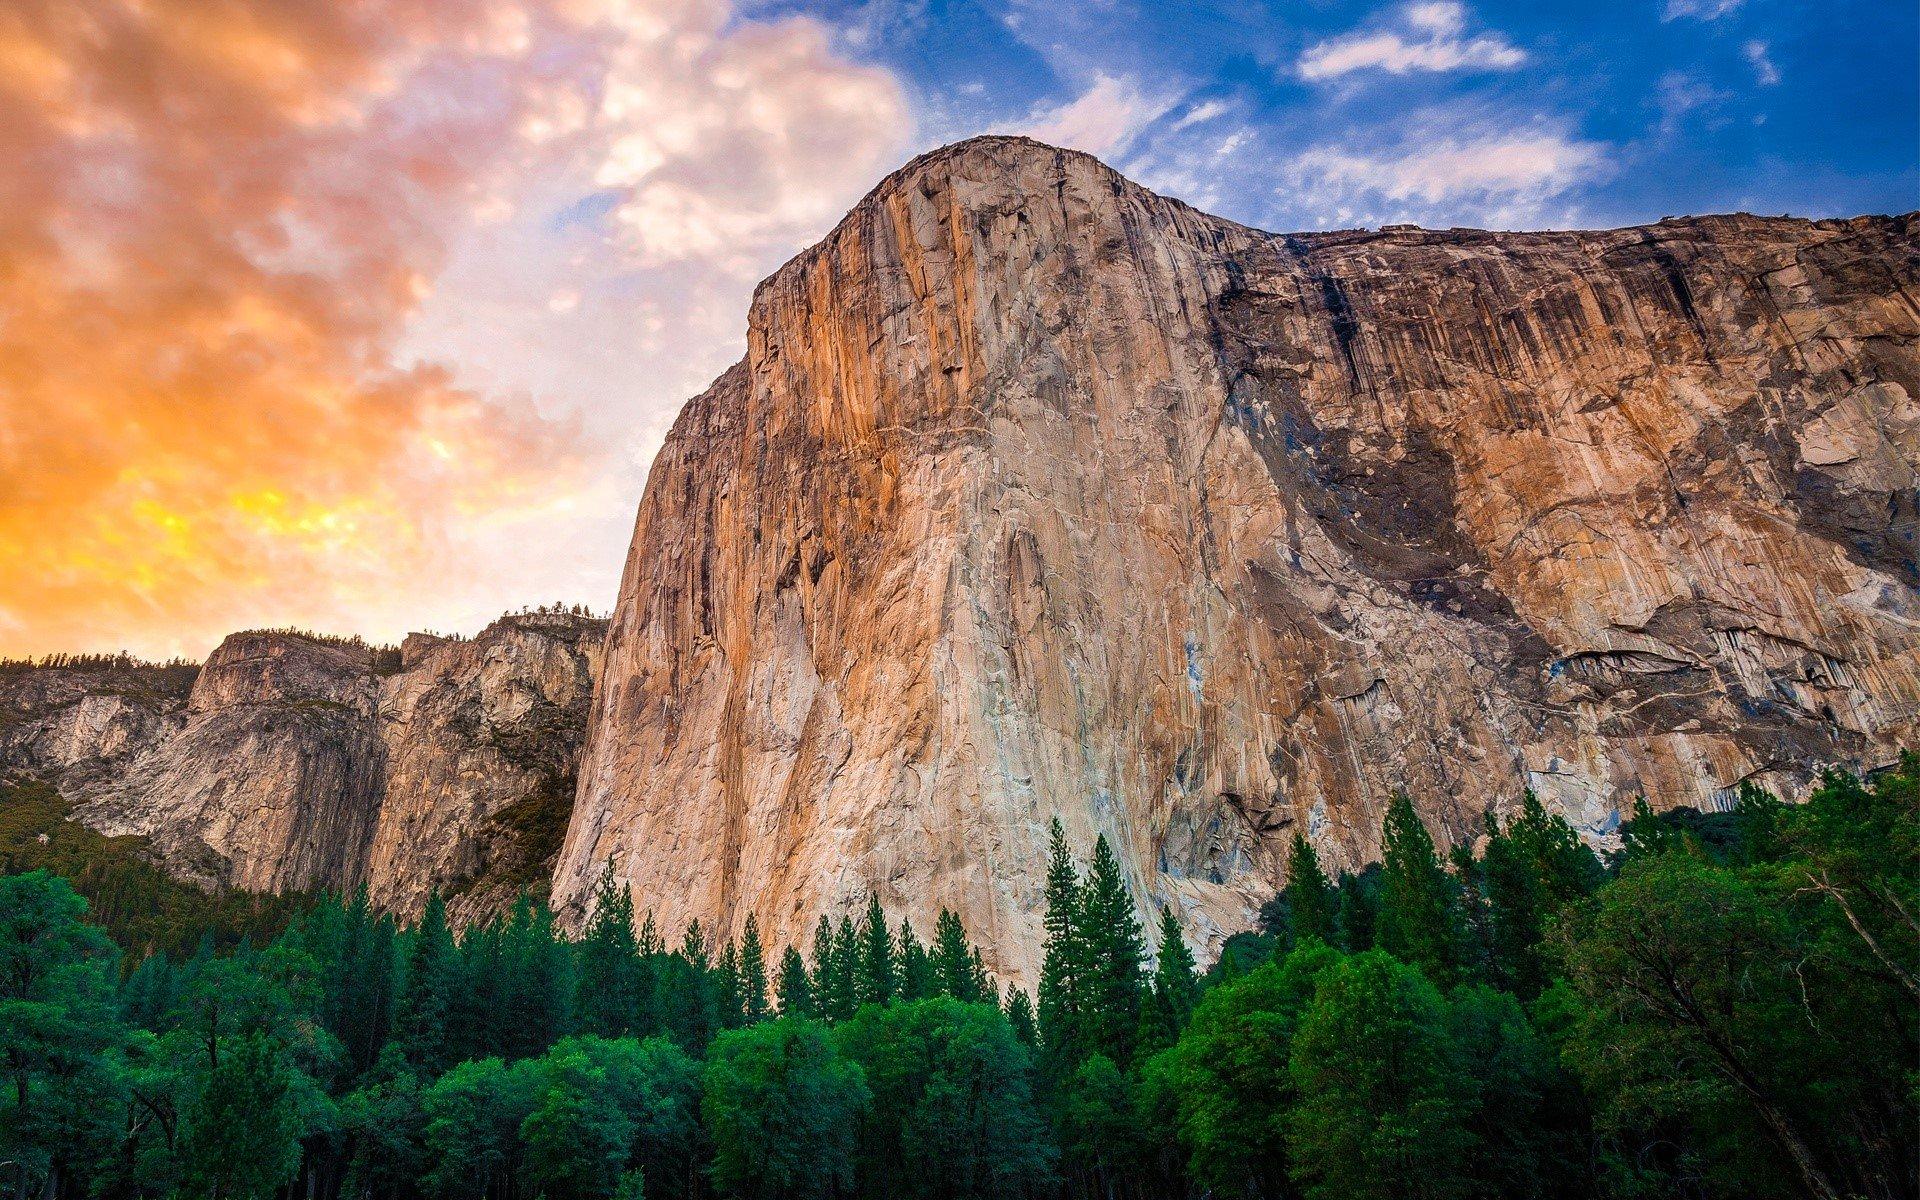 Wallpaper Montañas Yosemite Images